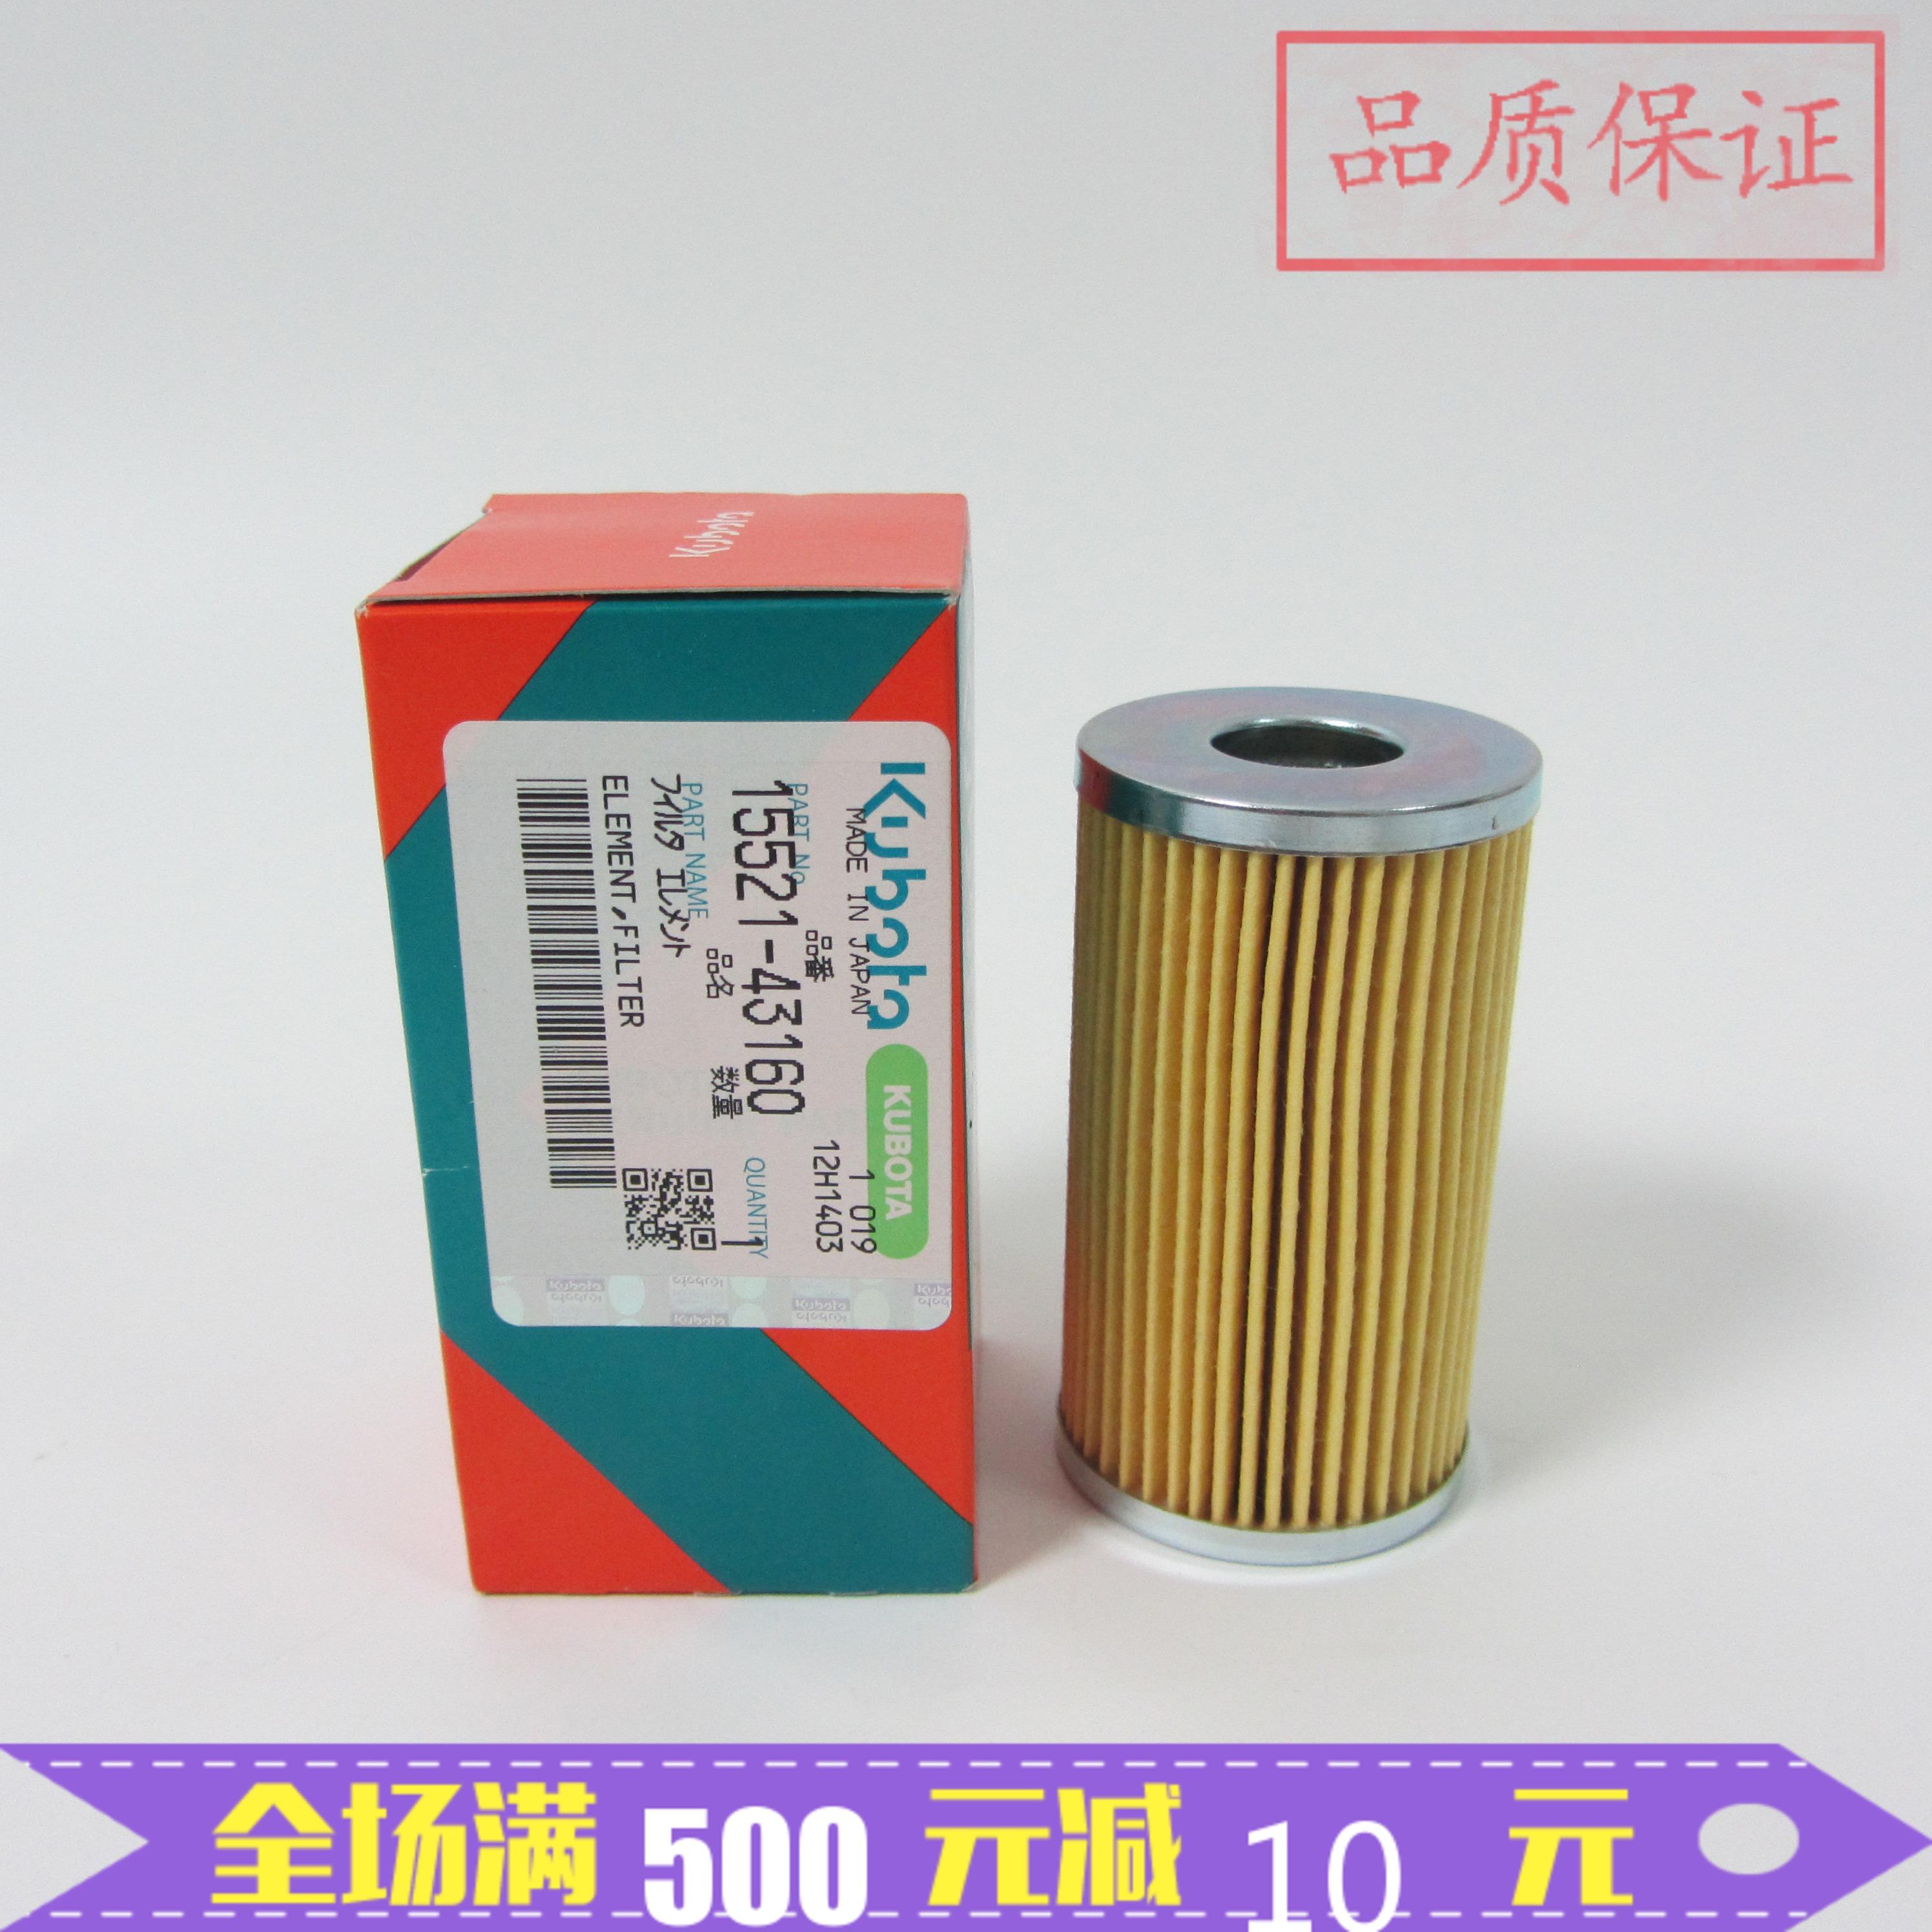 USD 38 88] Kubota sel generator set sel filter